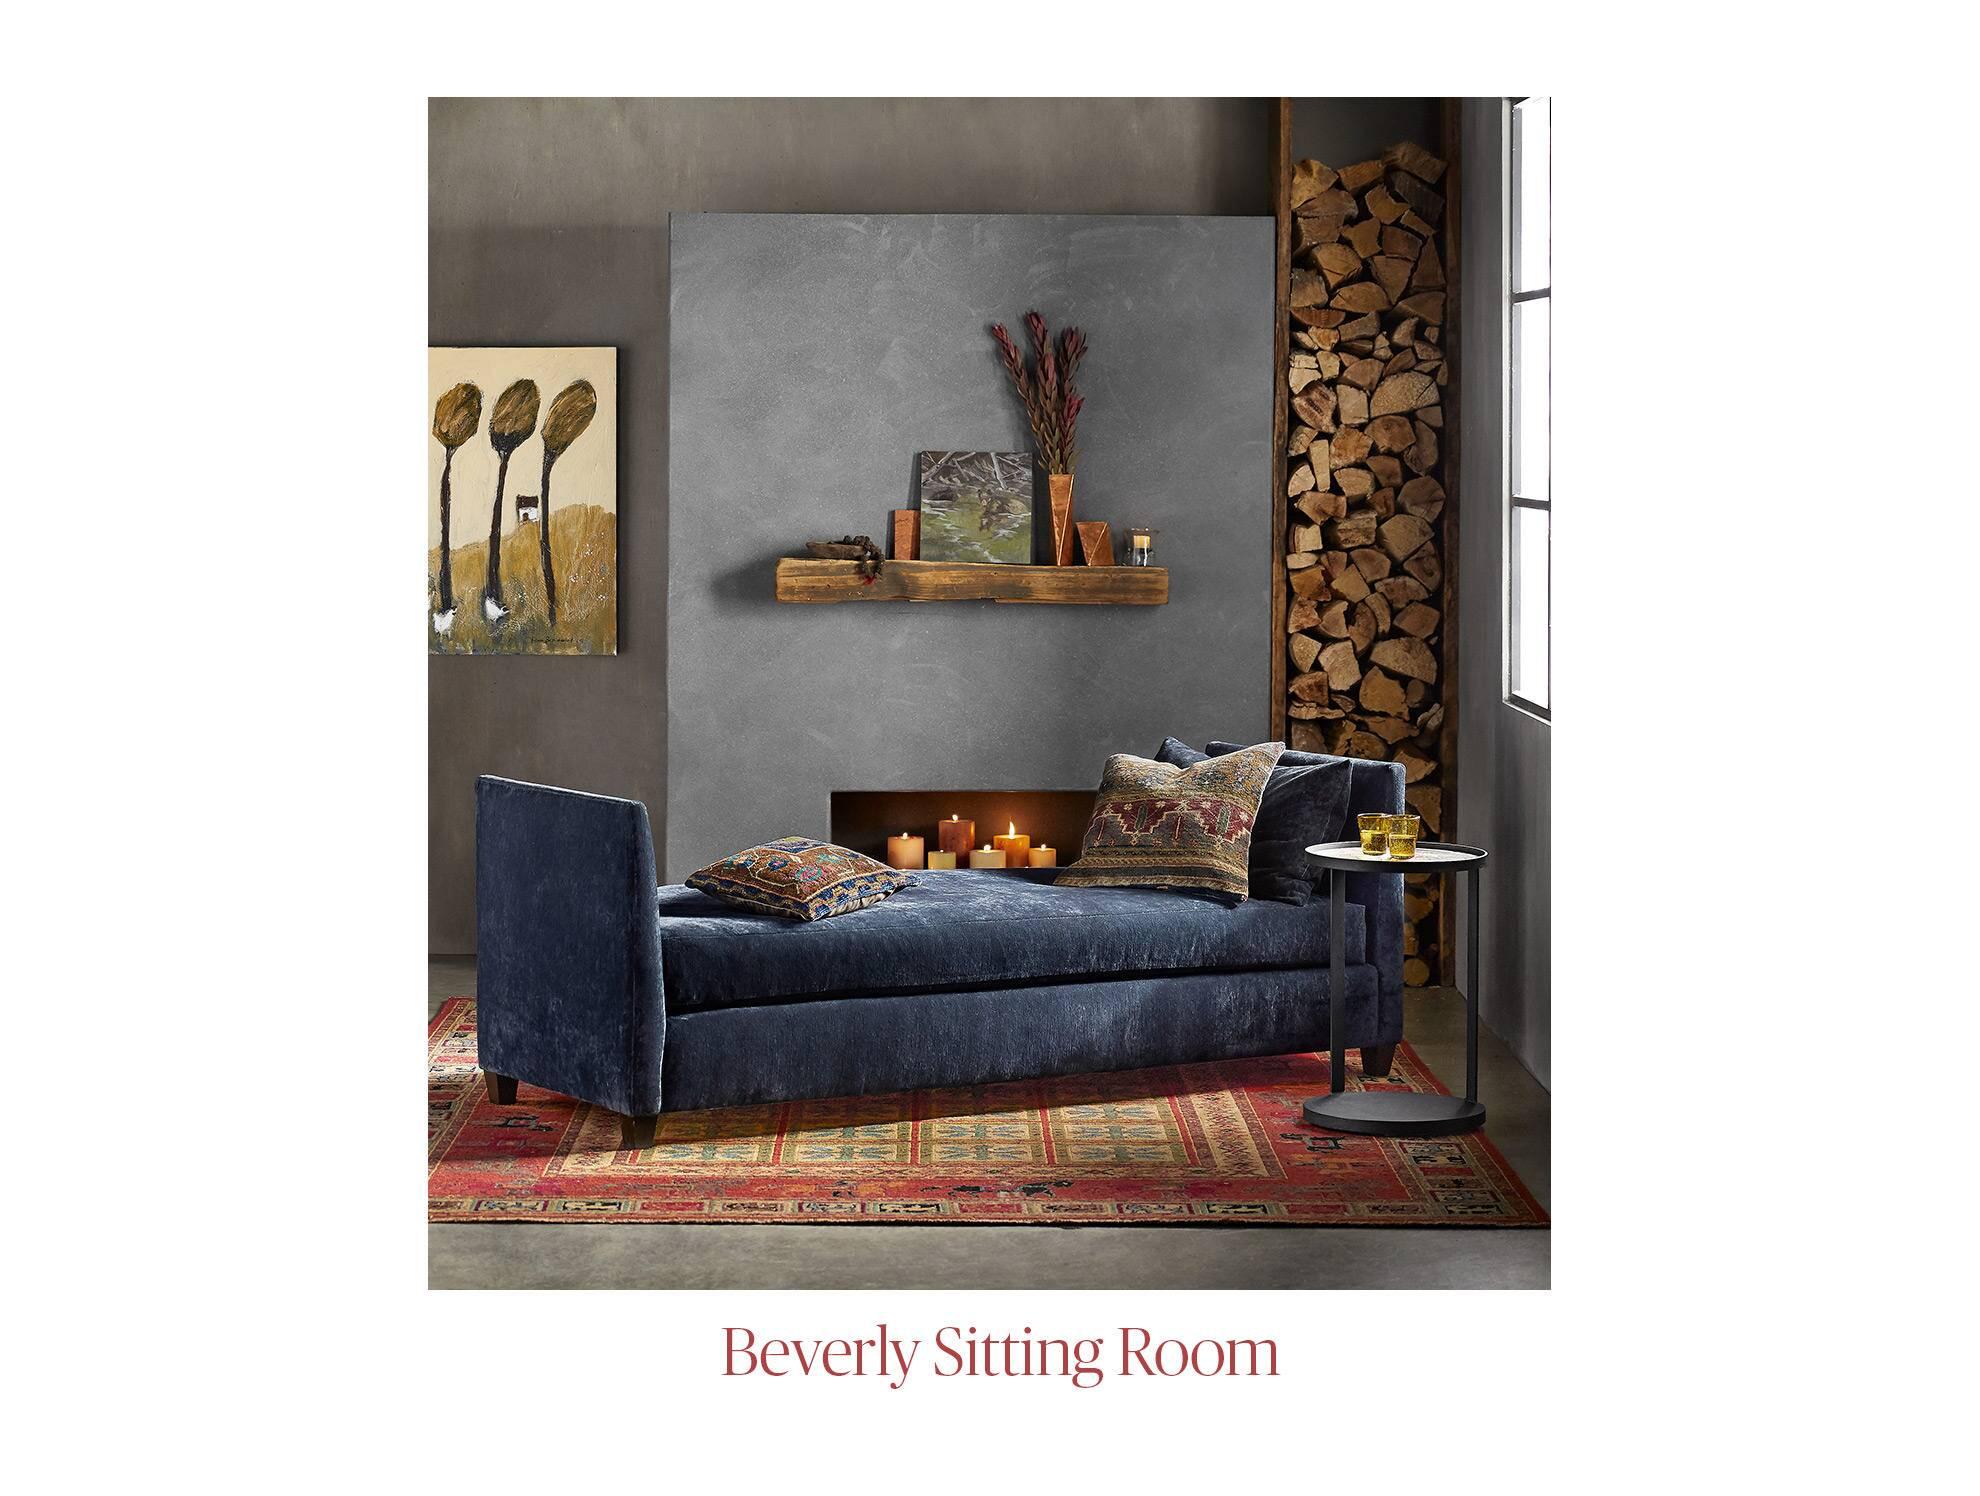 Beverly Sitting Room